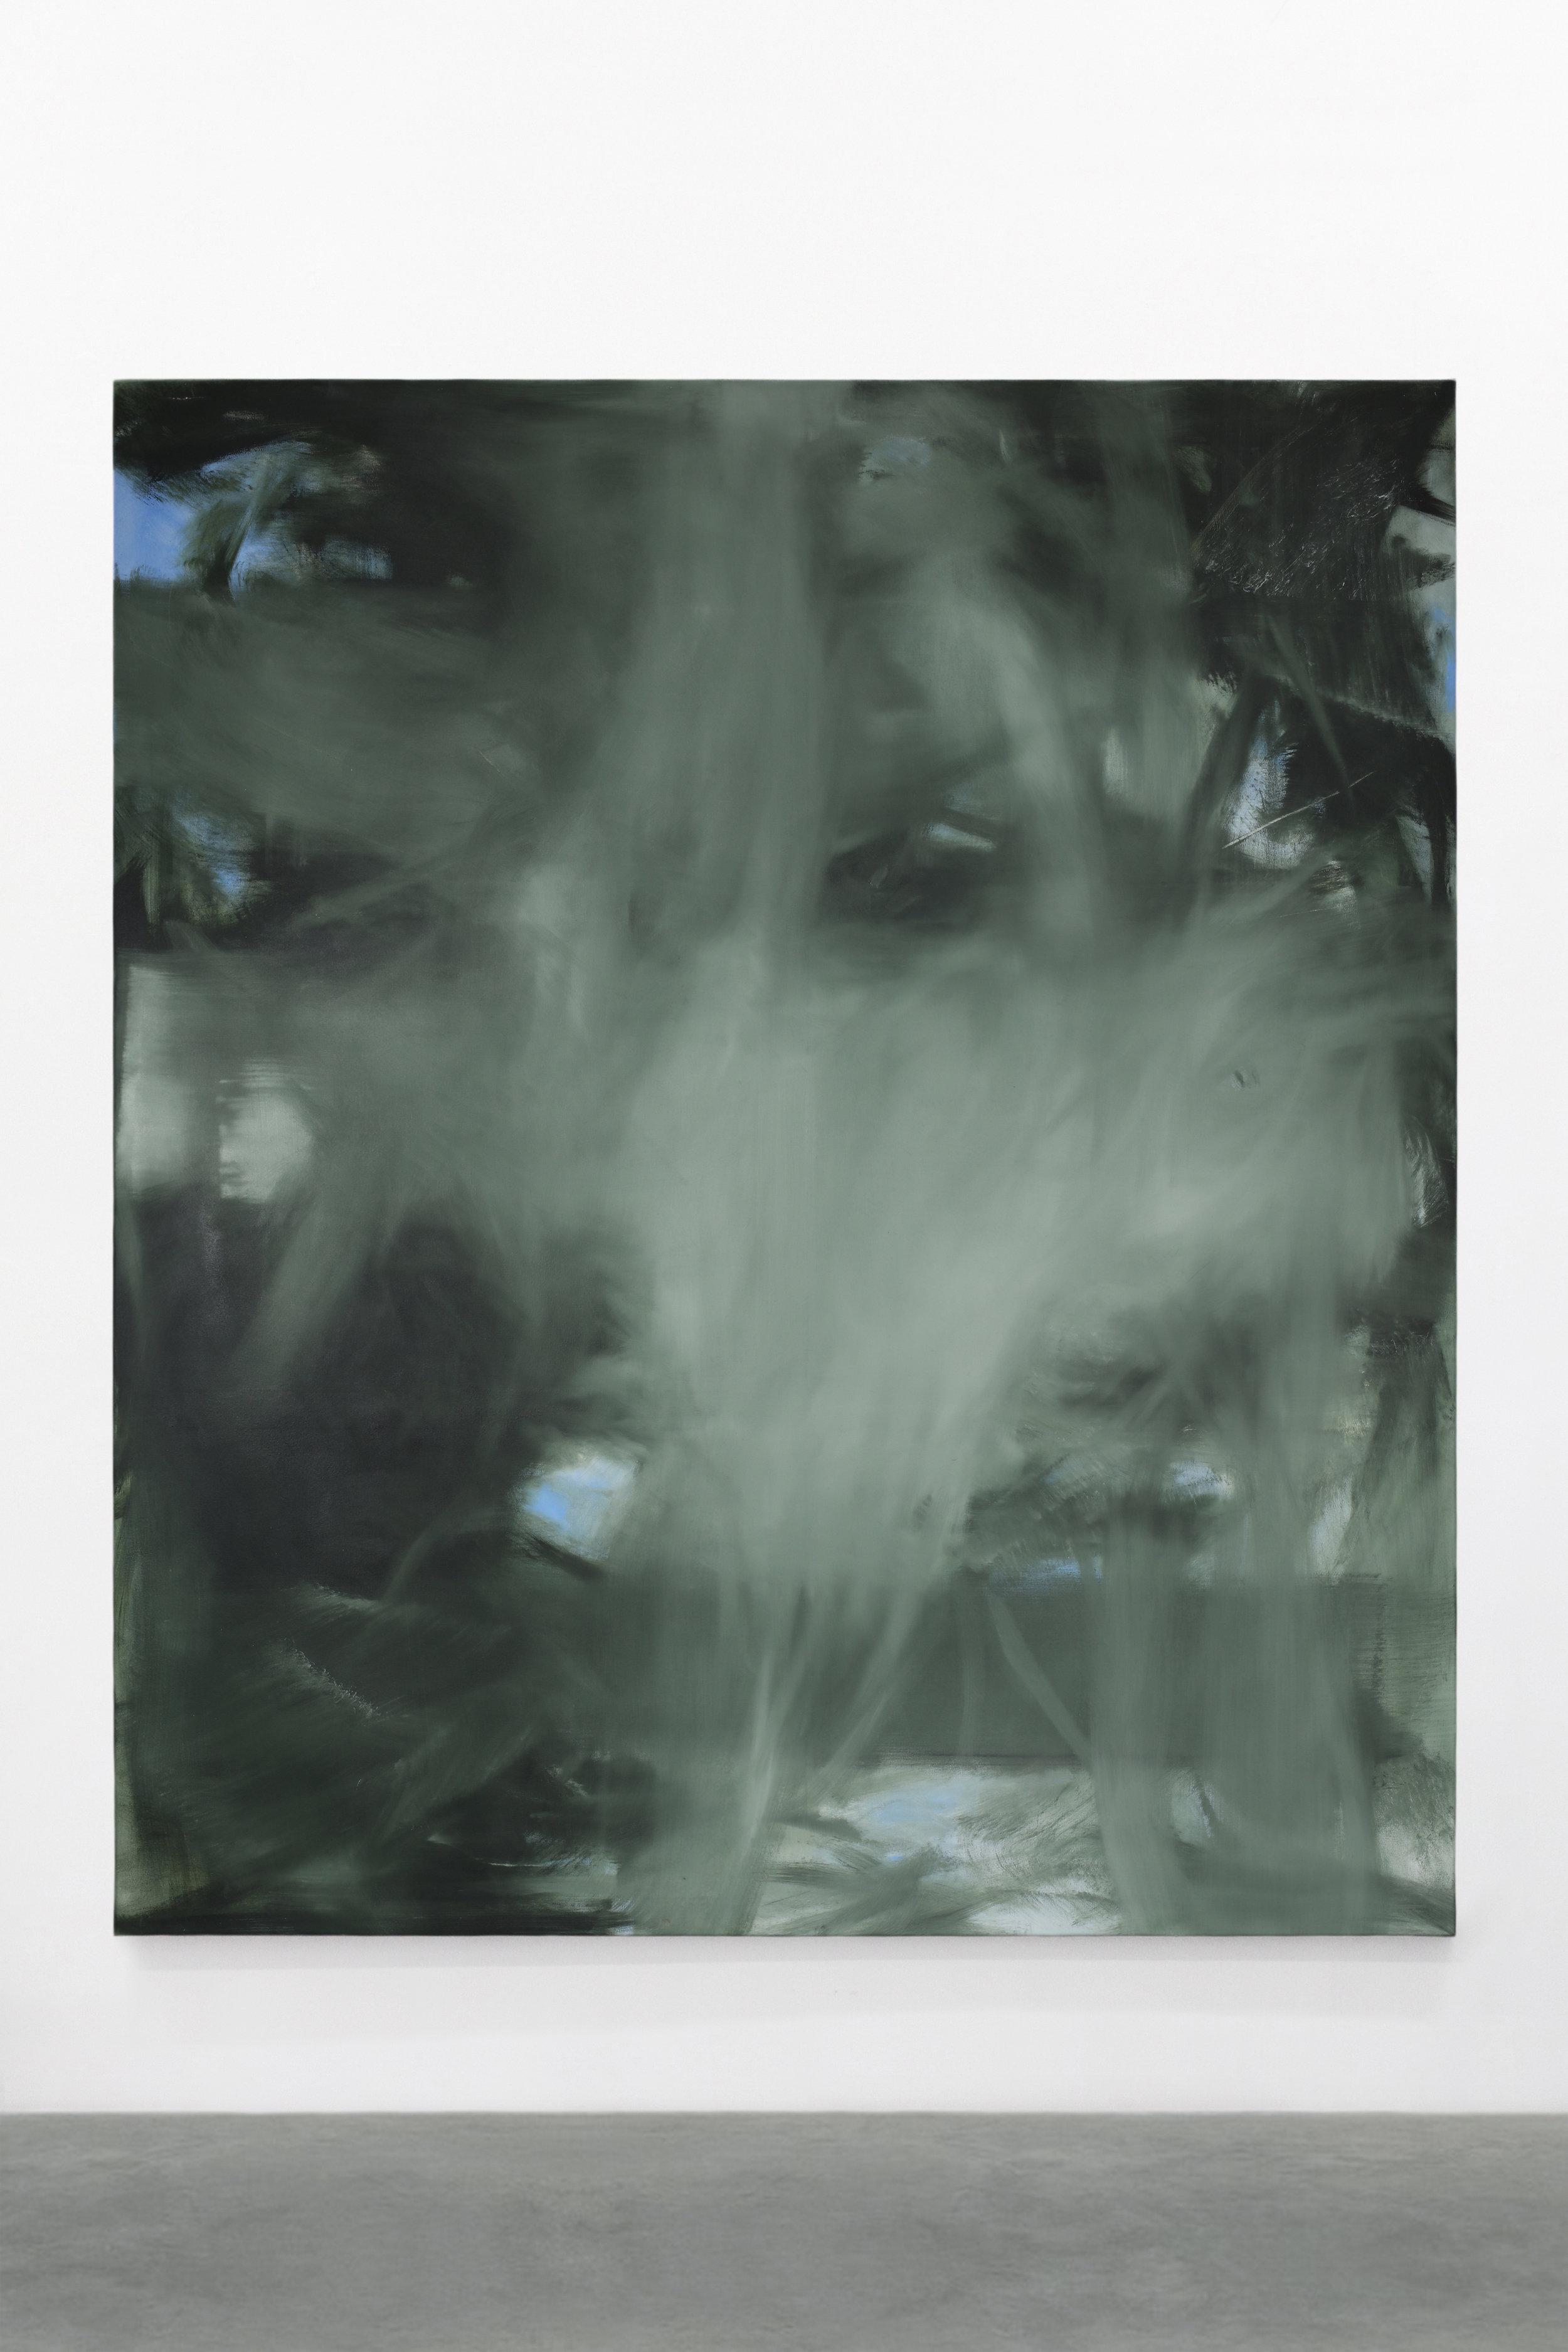 S. Derviz, Unititled, oil on canvas, 220x190cm, 2018 (4.1).jpg